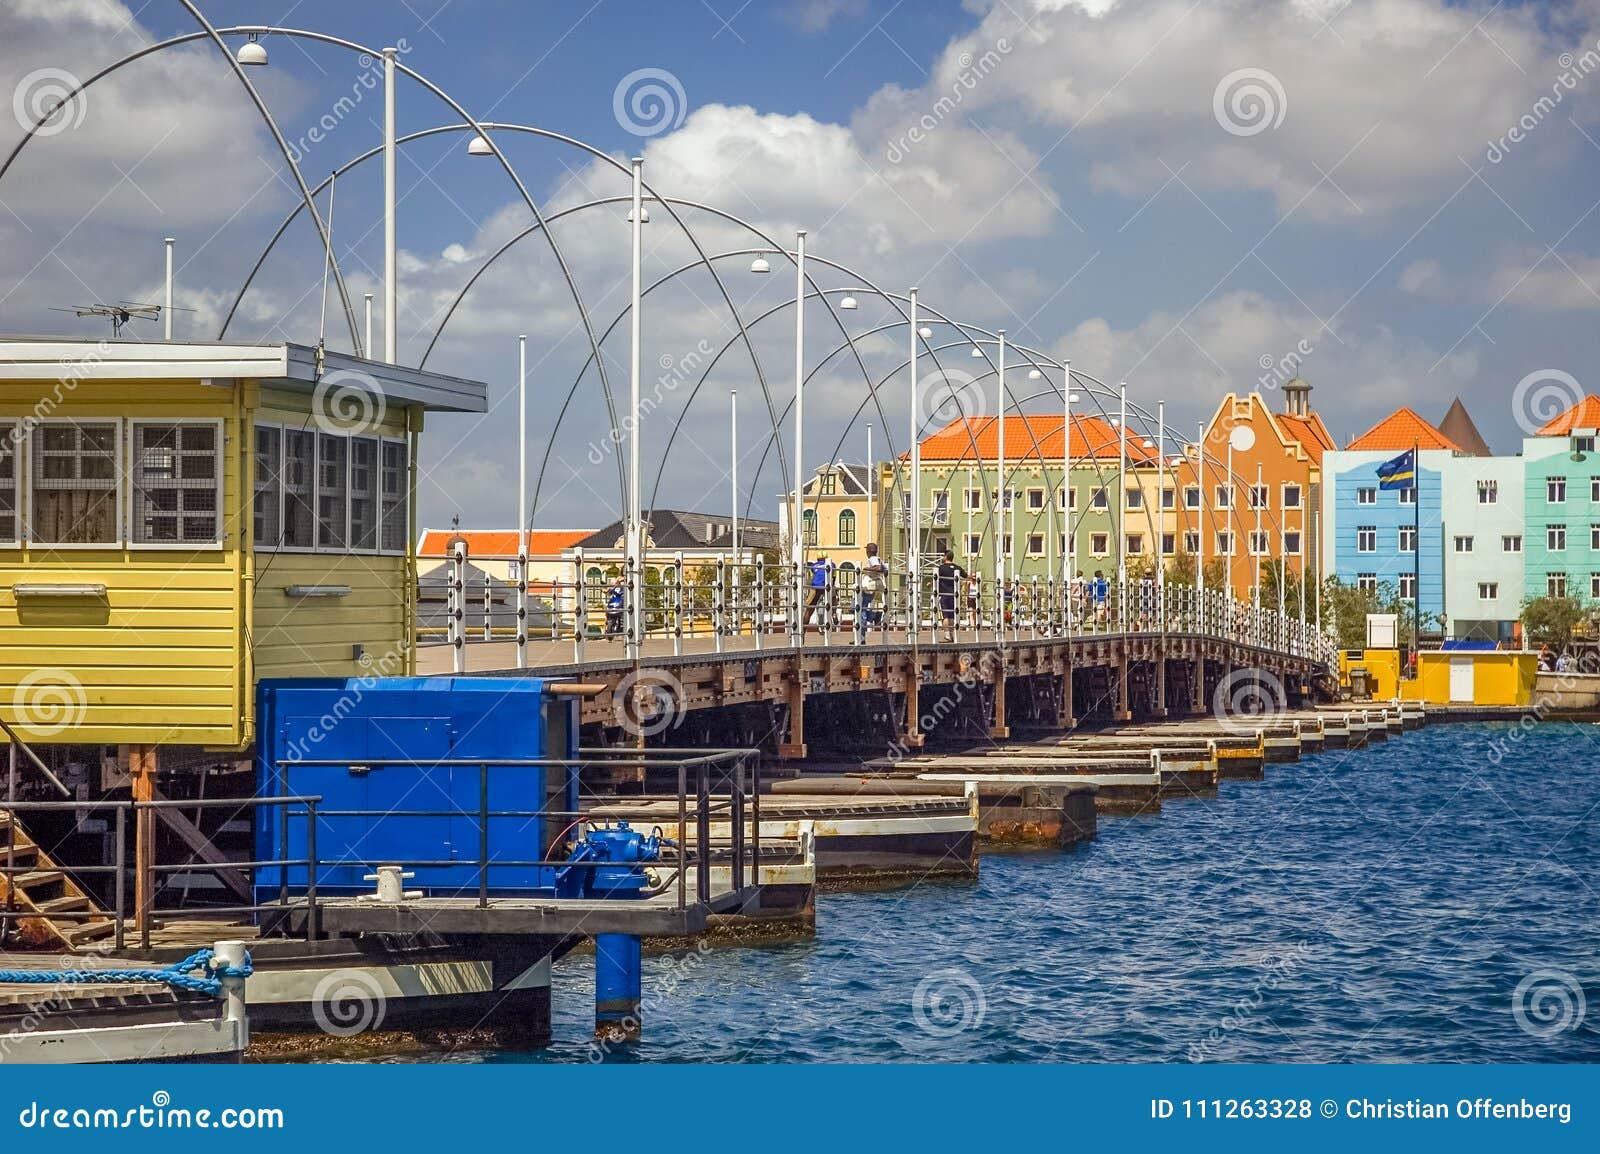 Reina Emma Bridge Willemstad, Curaçao